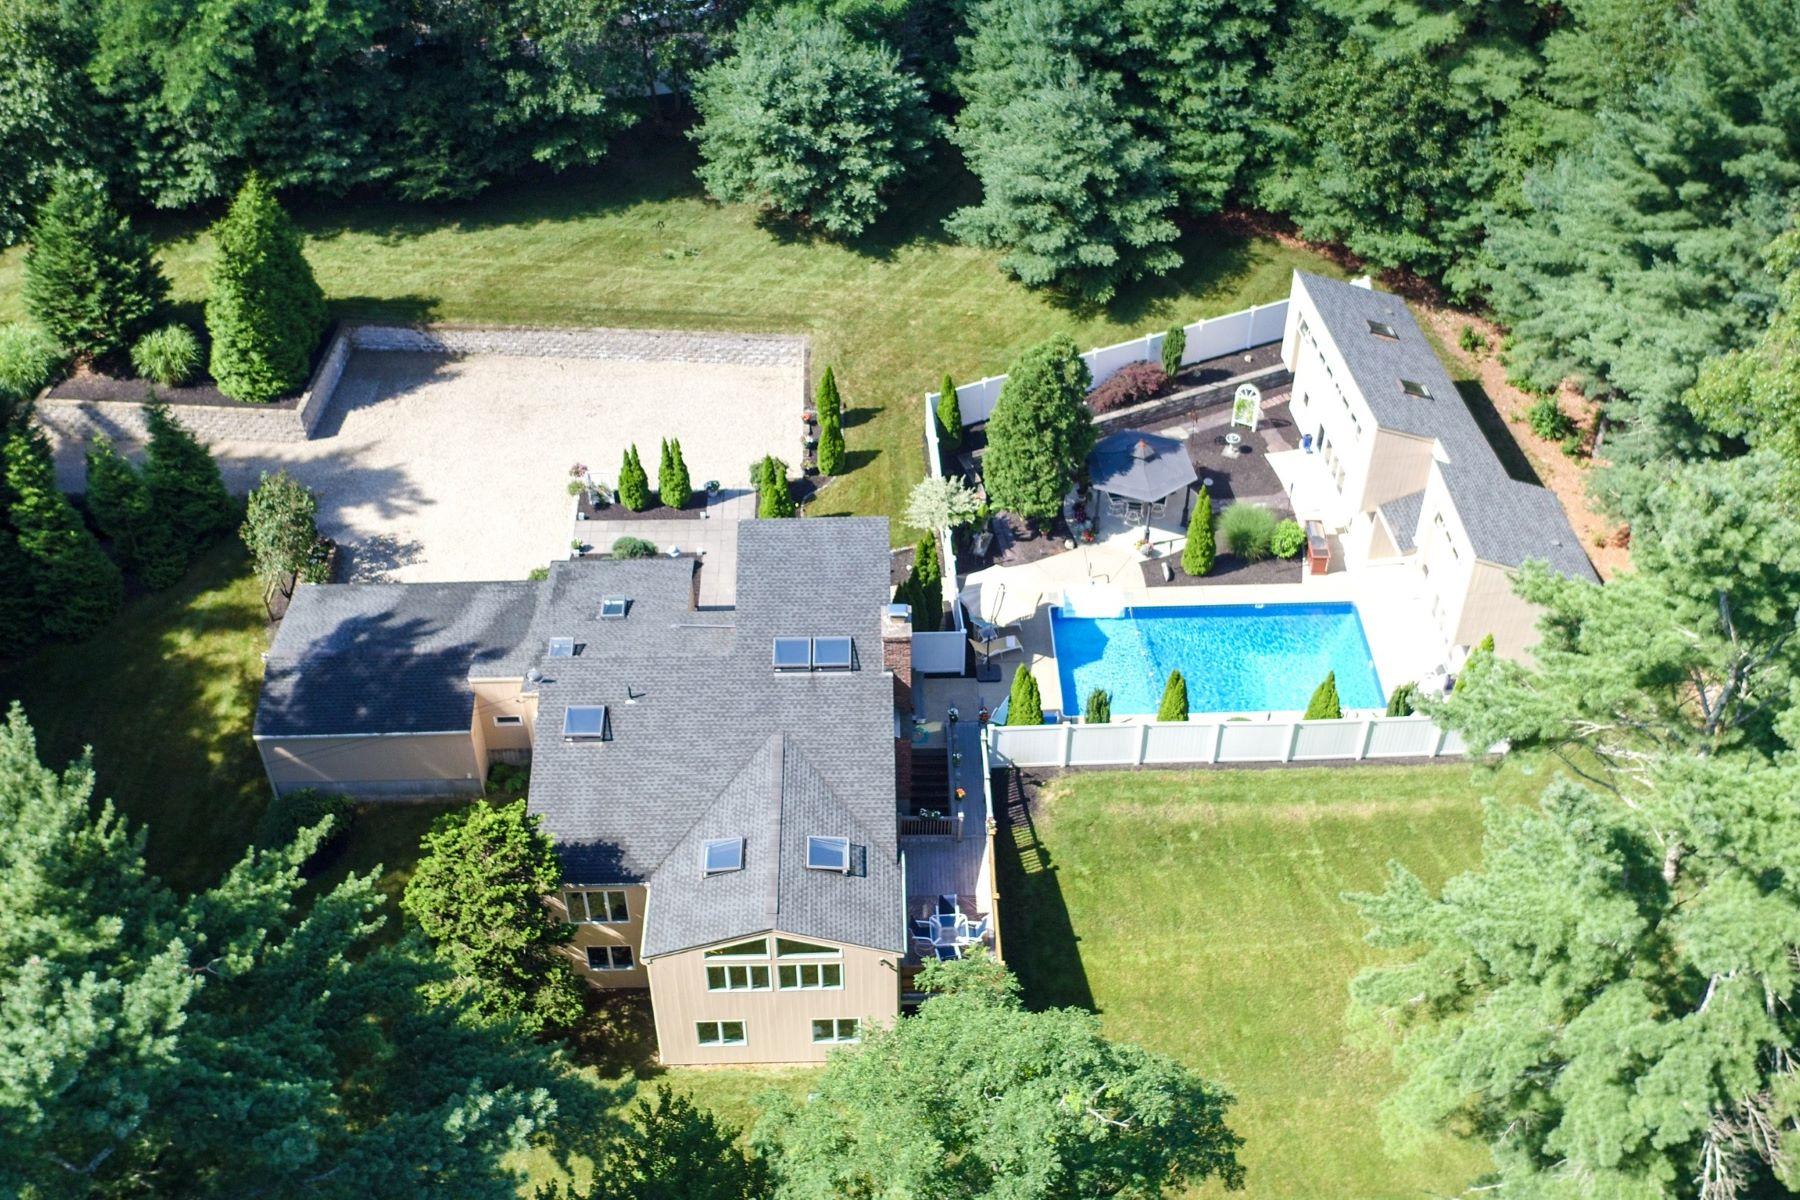 Single Family Homes για την Πώληση στο Private Mid-Century Modern 52 School Street, Duxbury, Μασαχουσετη 02332 Ηνωμένες Πολιτείες